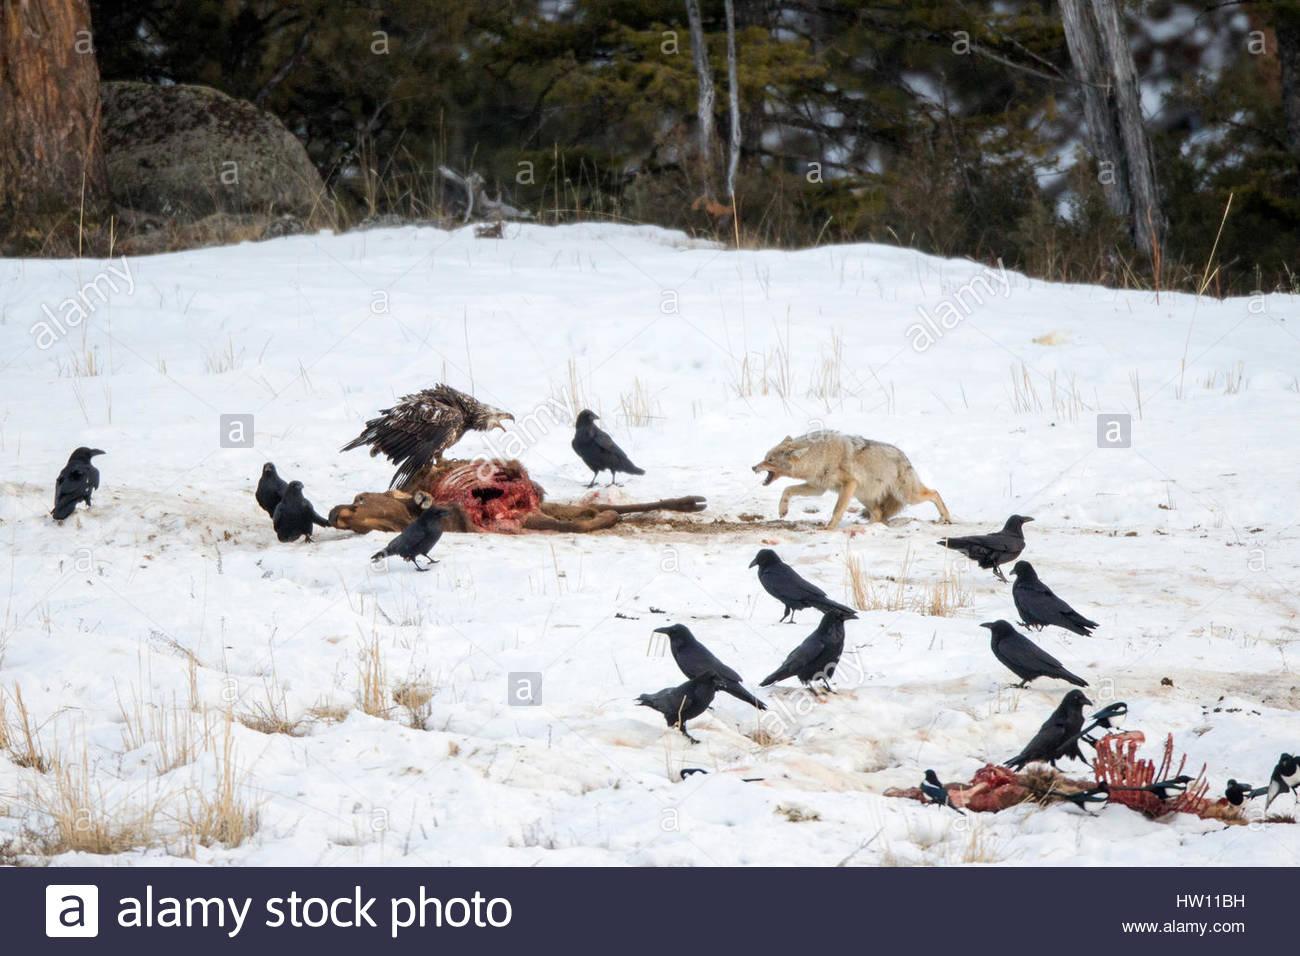 A coyote, Canis latrans, snarls at a juvenile bald eagle eating fresh kill. - Stock Image